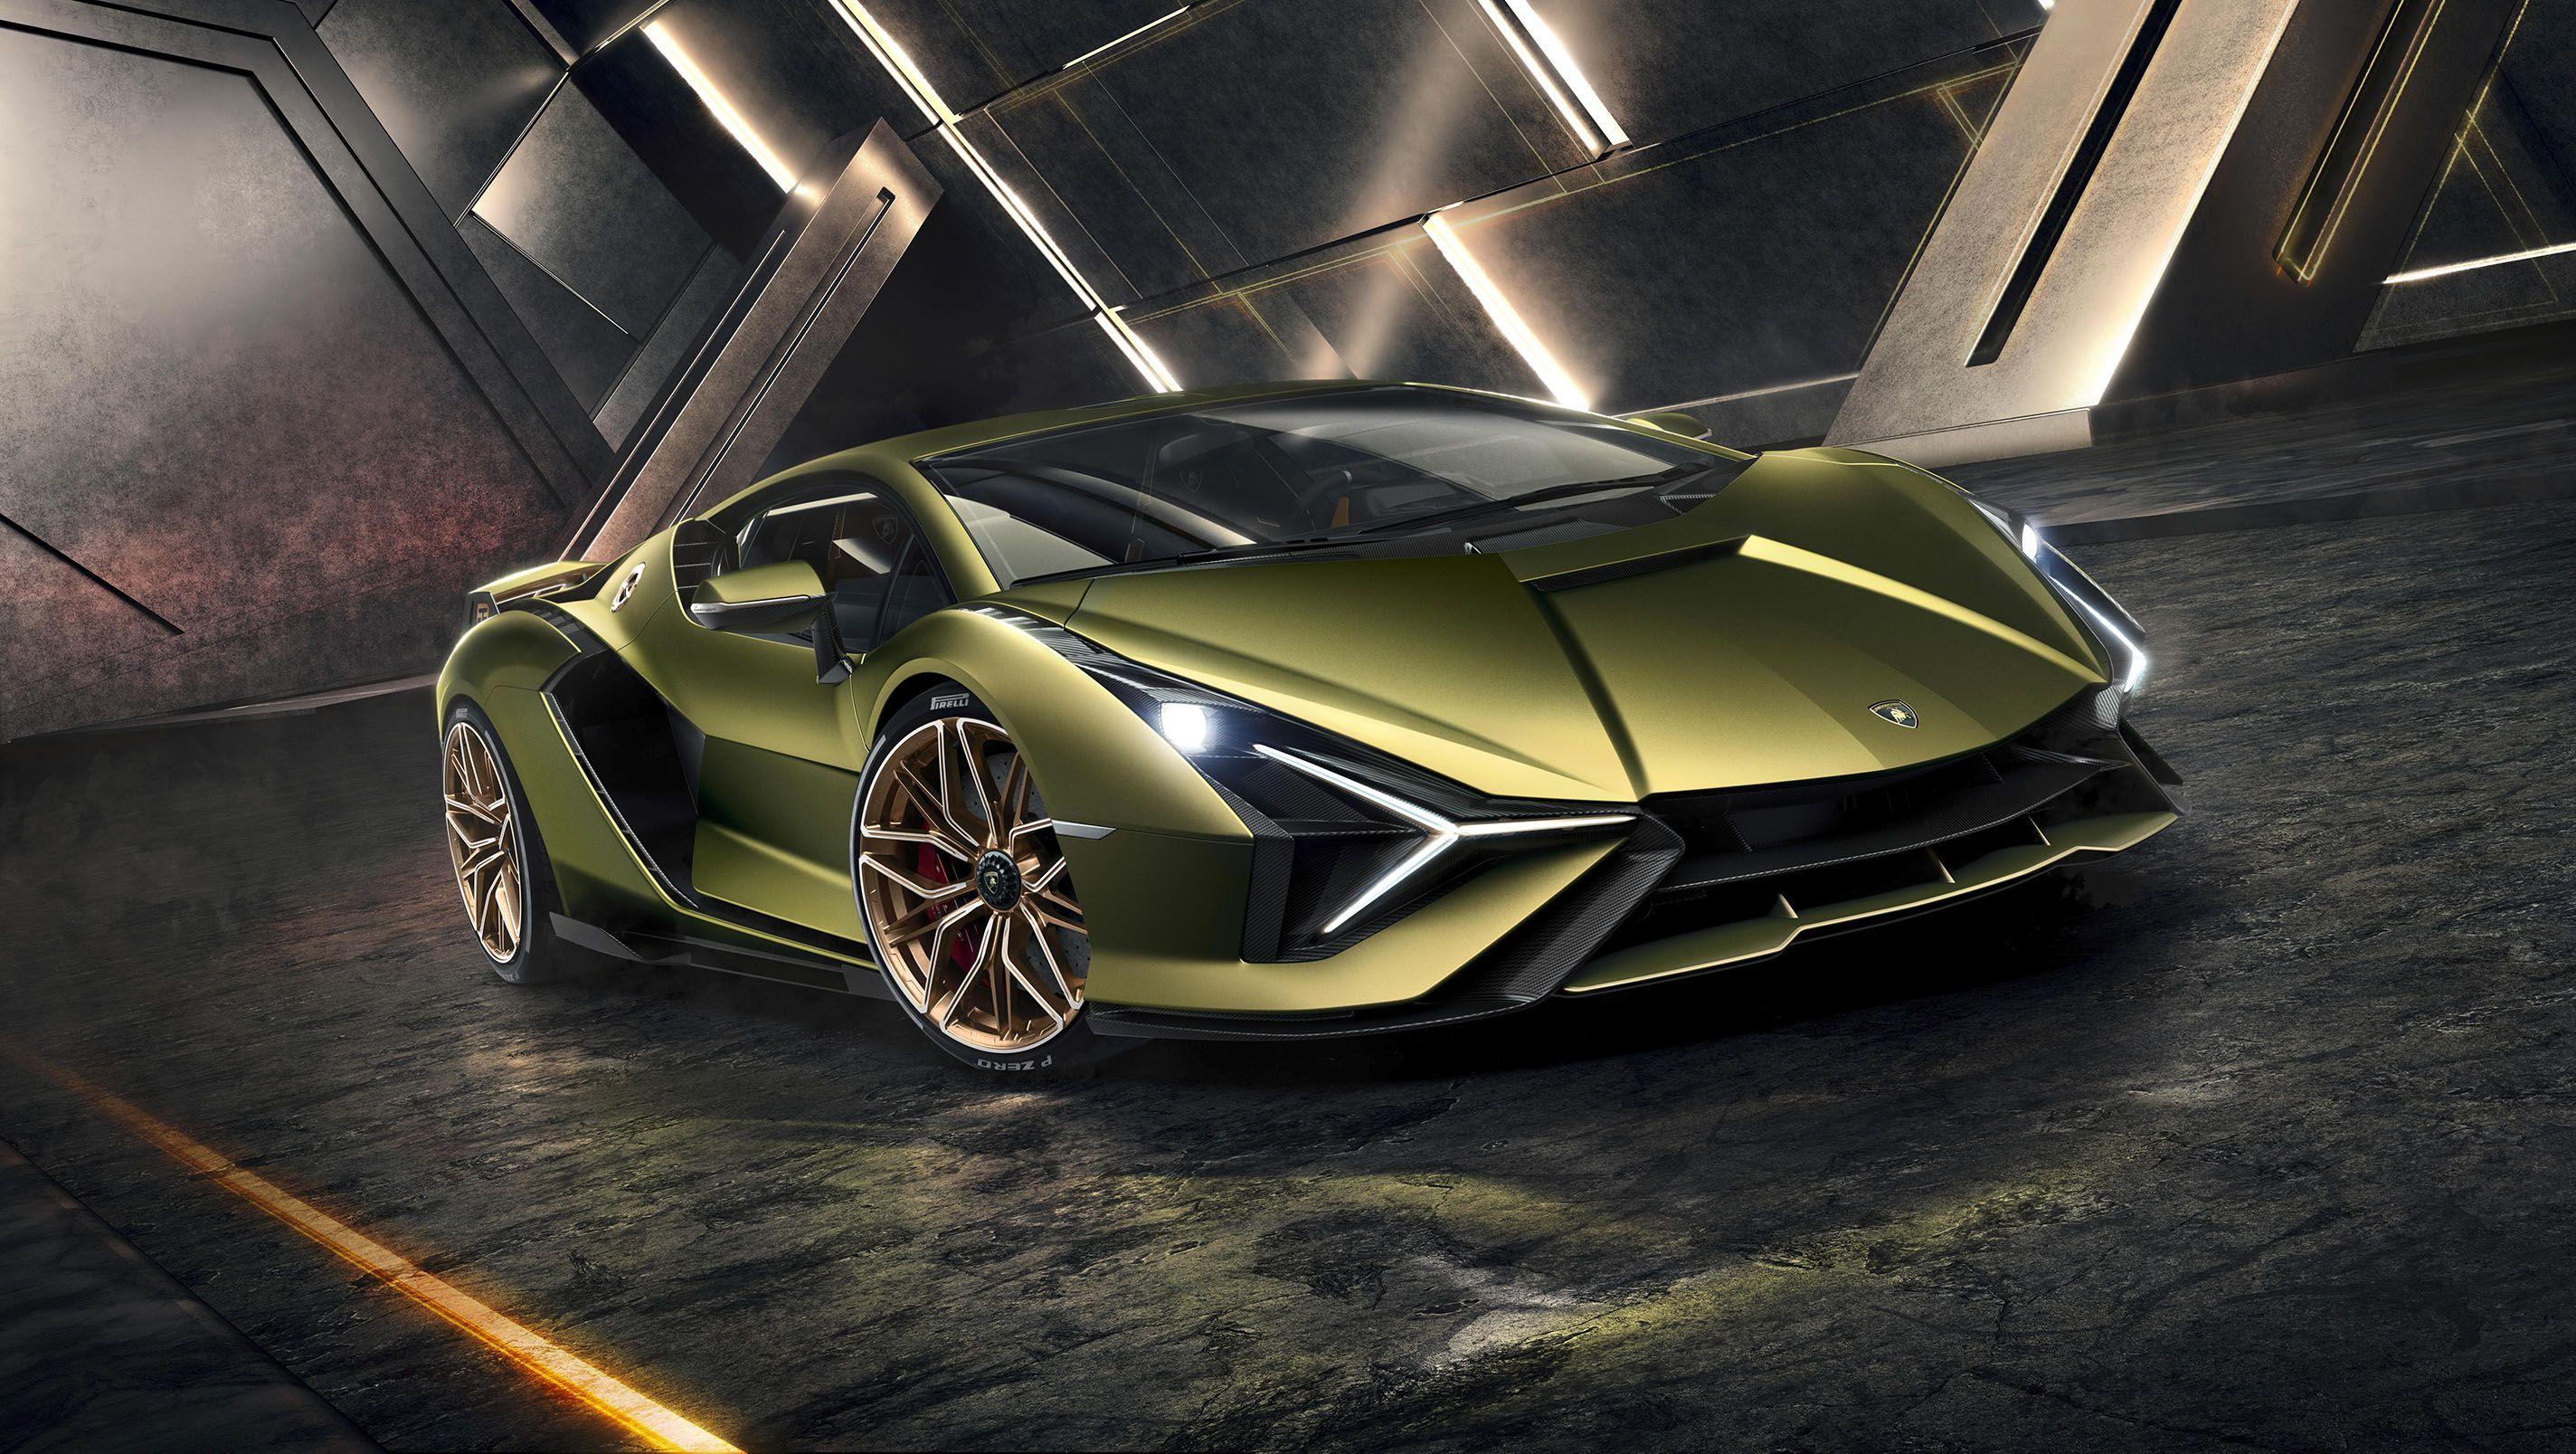 2020 Lamborghini Sián V,12 Hybrid Hypercar Revealed